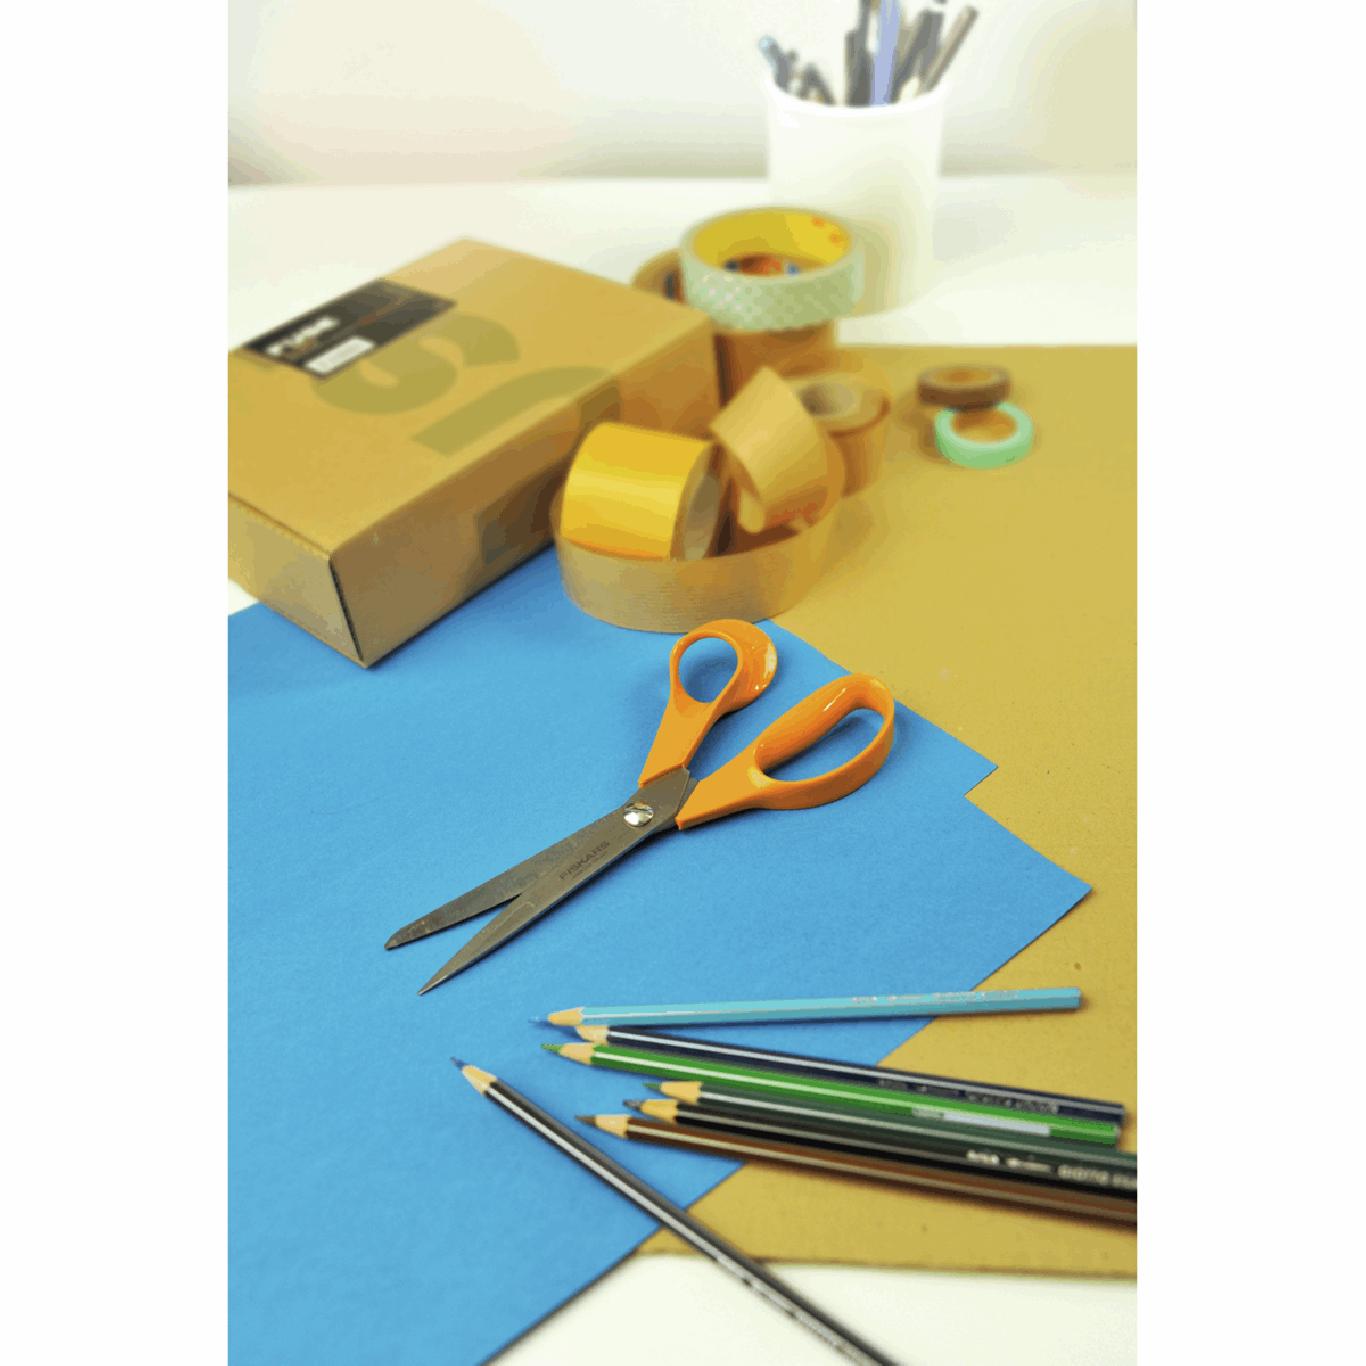 Fiskars General Purpose Scissors | 21cm